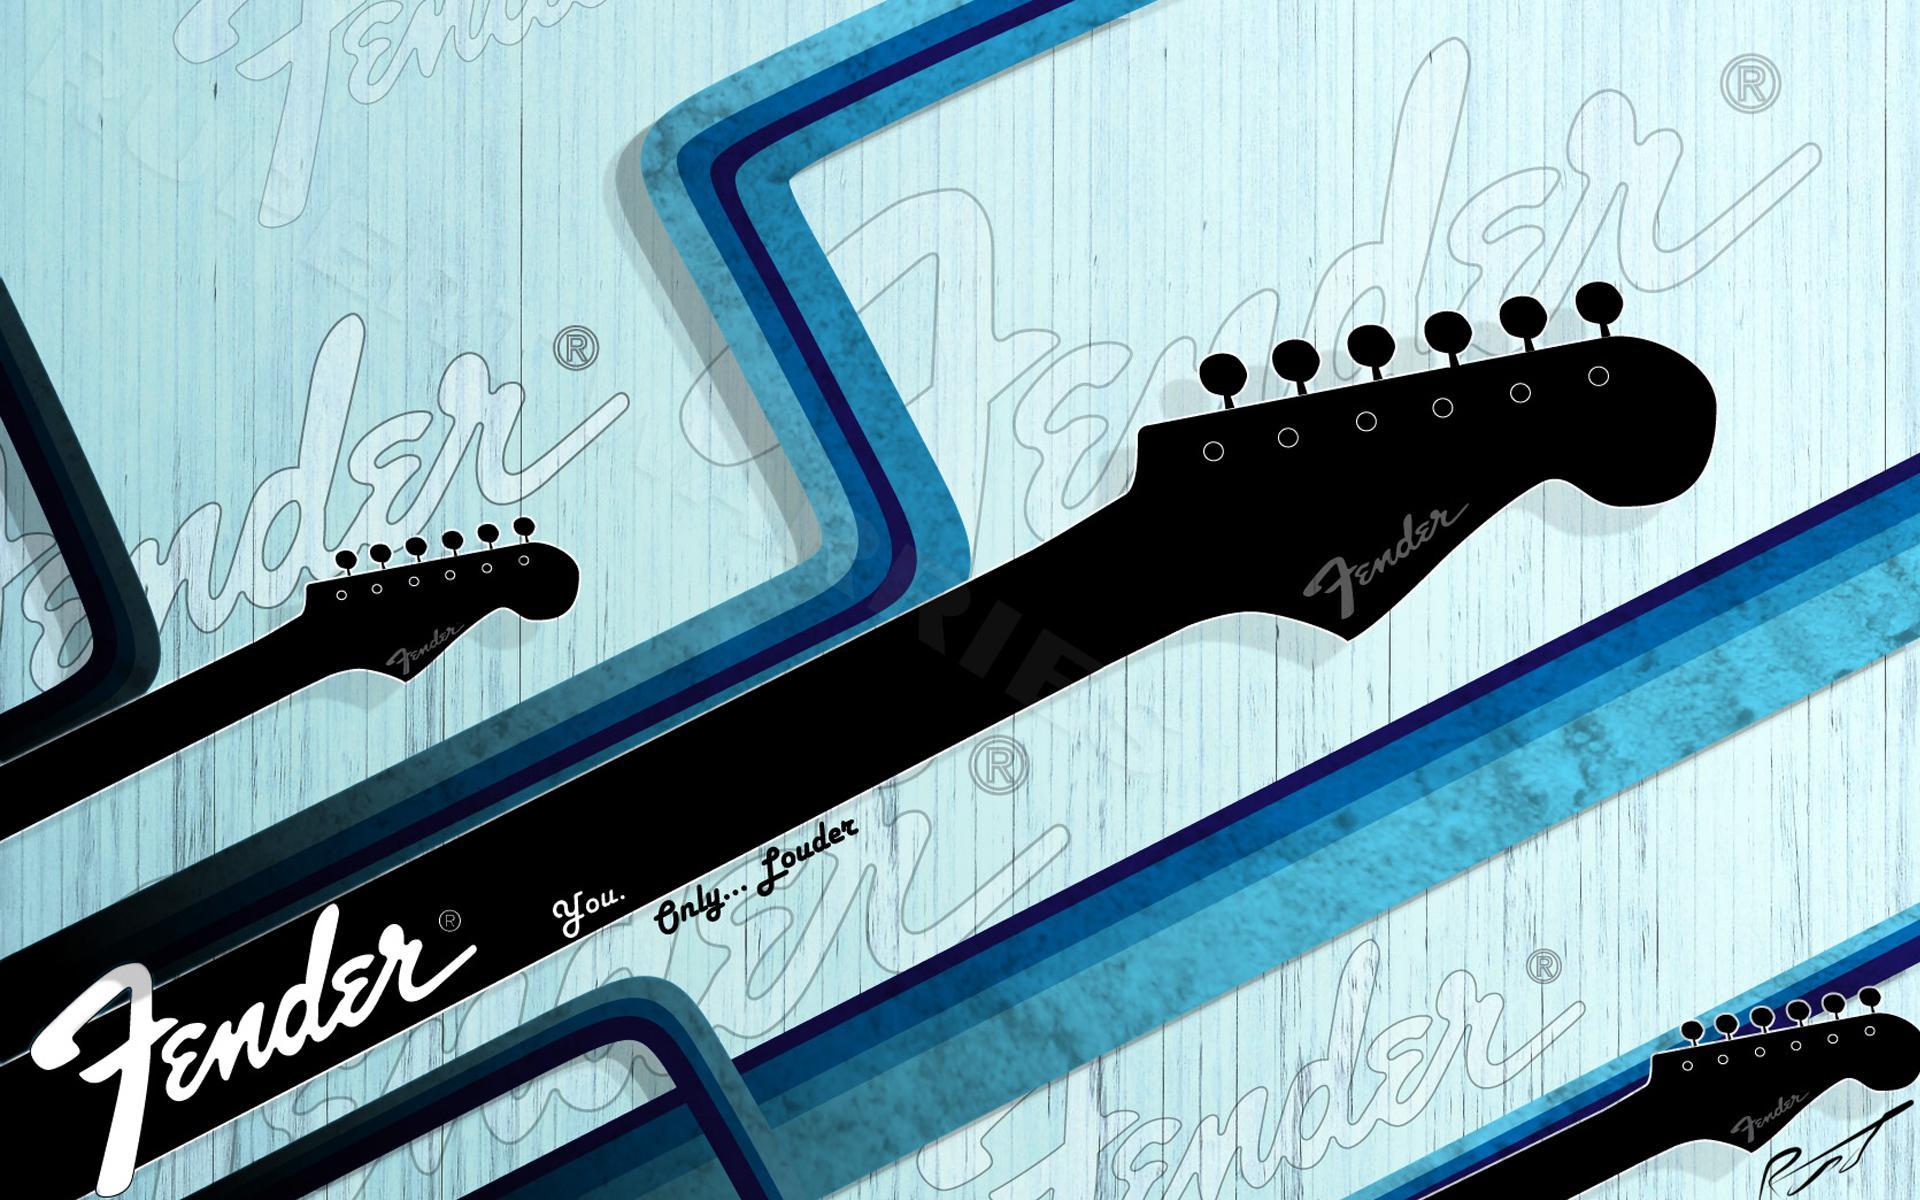 Fender   Guitar Wallpaper 27366949 1920x1200